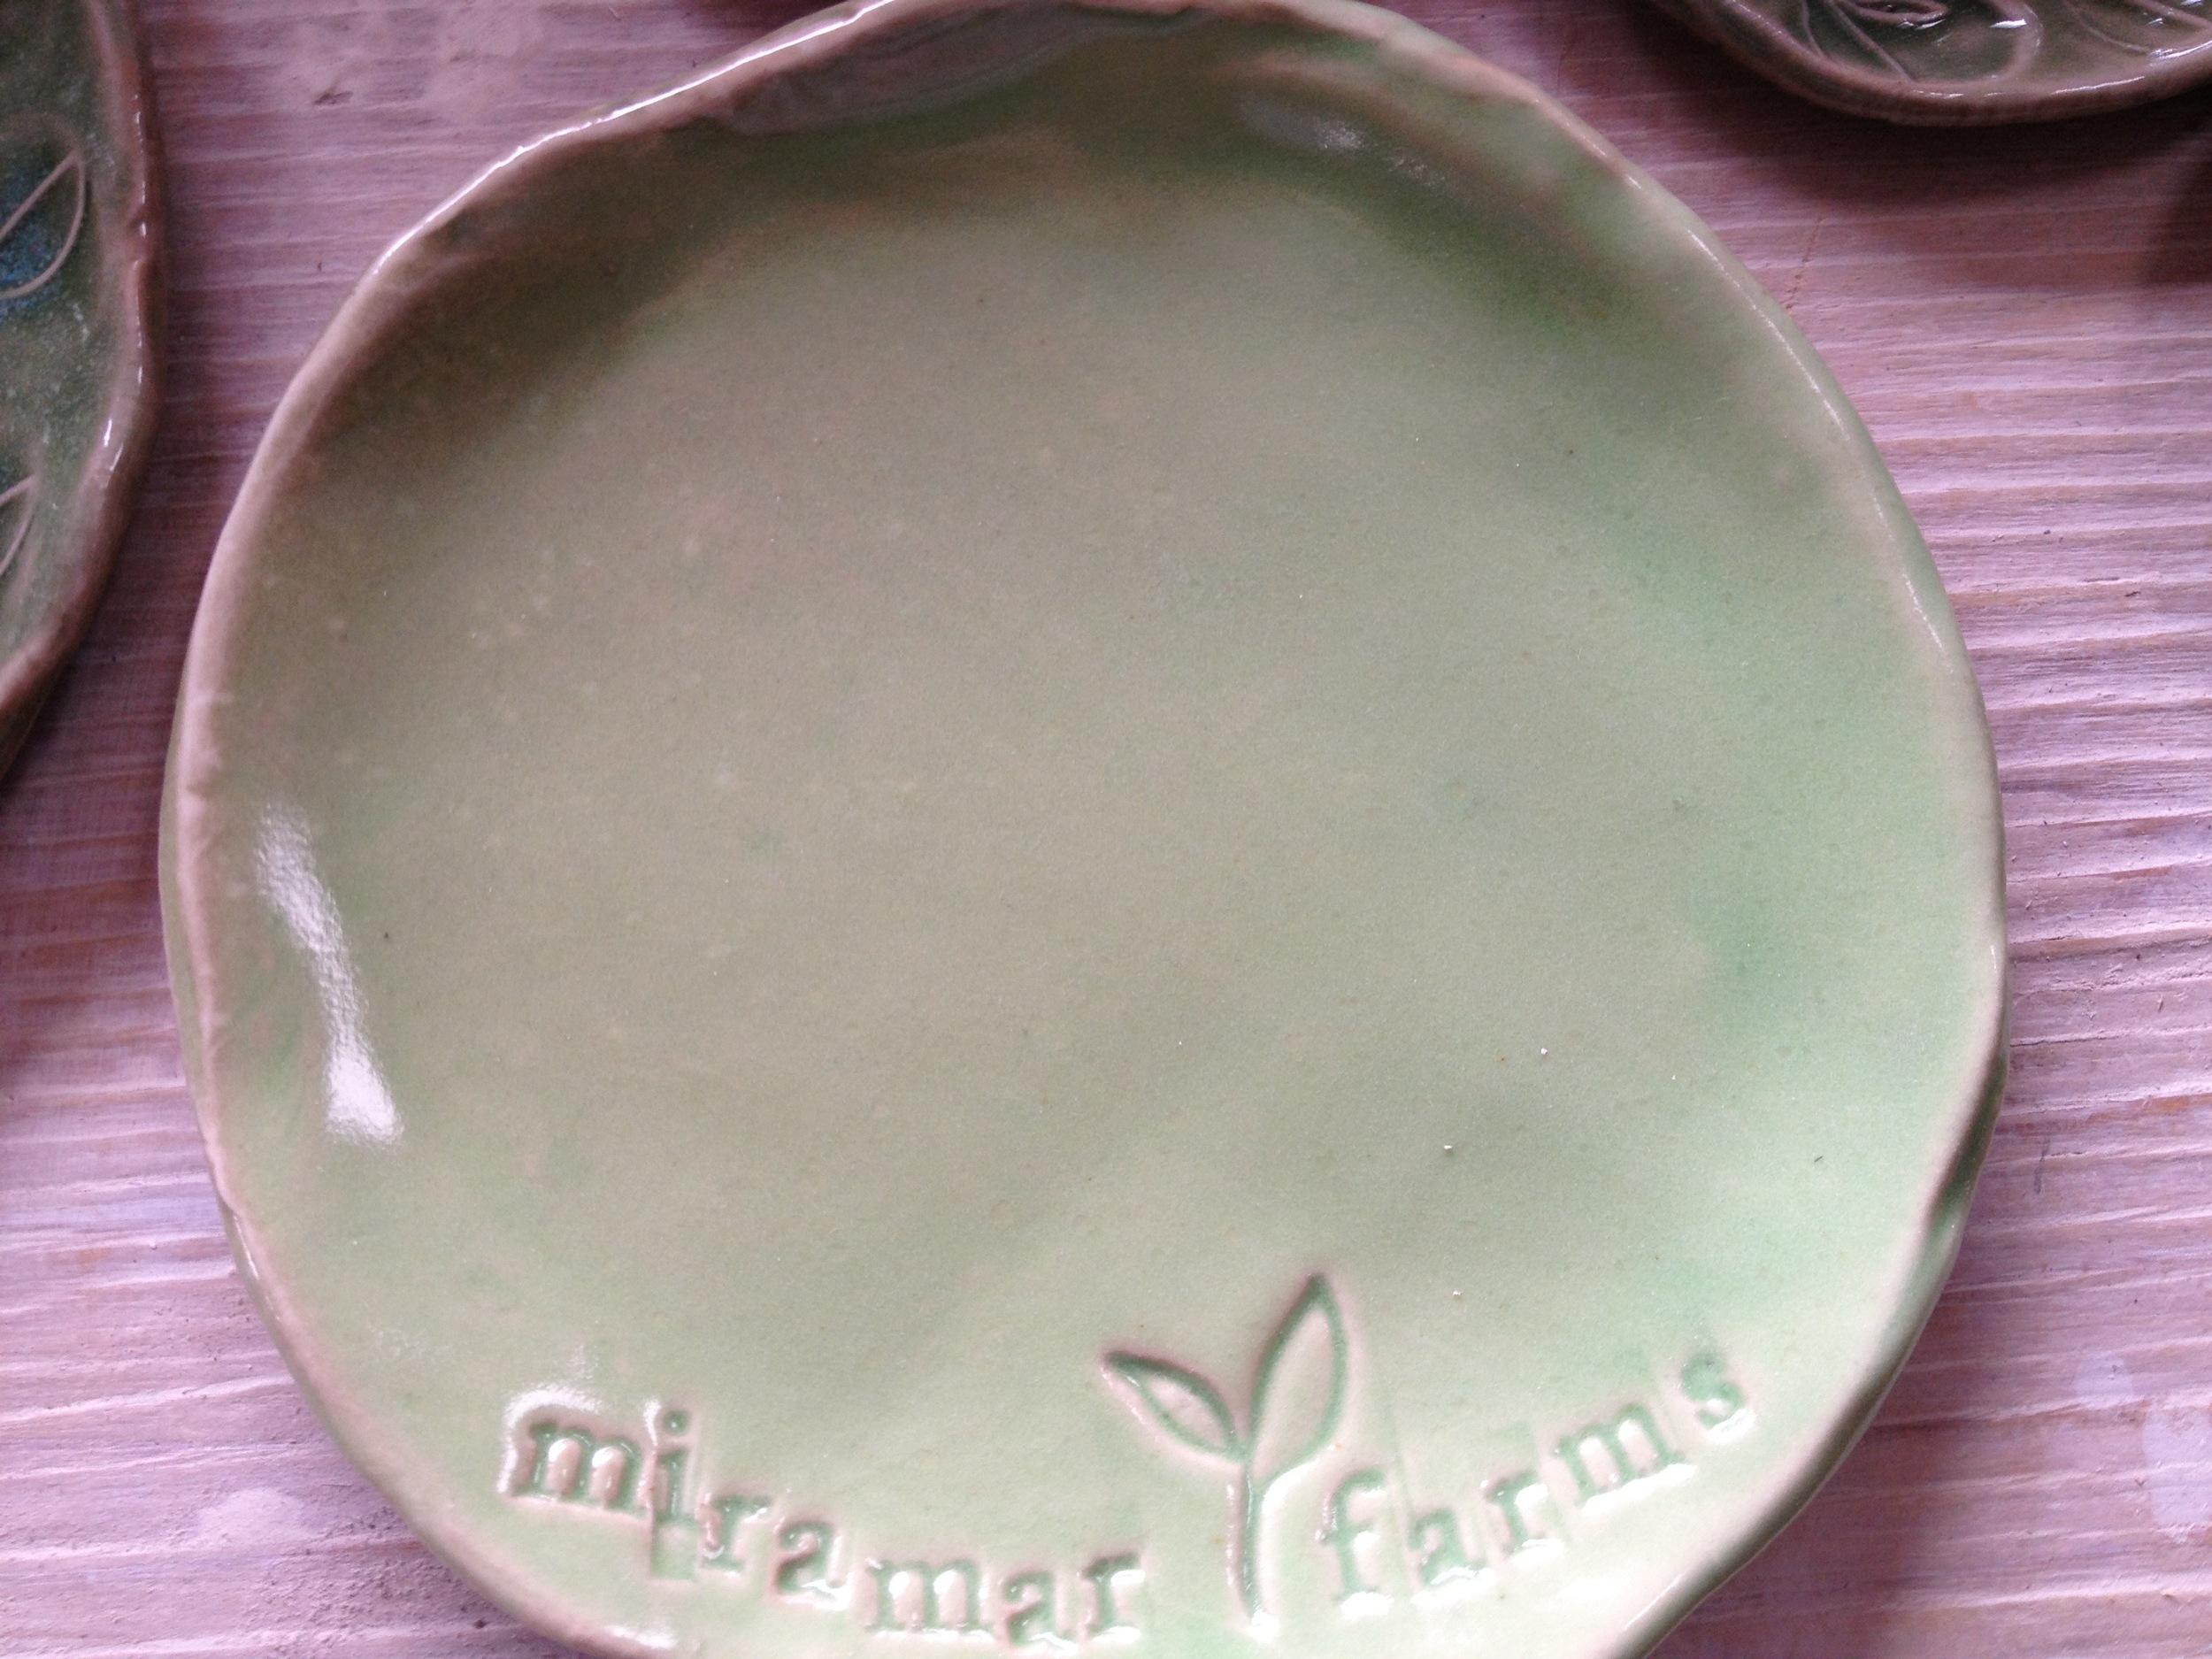 Miramar Farms little plate